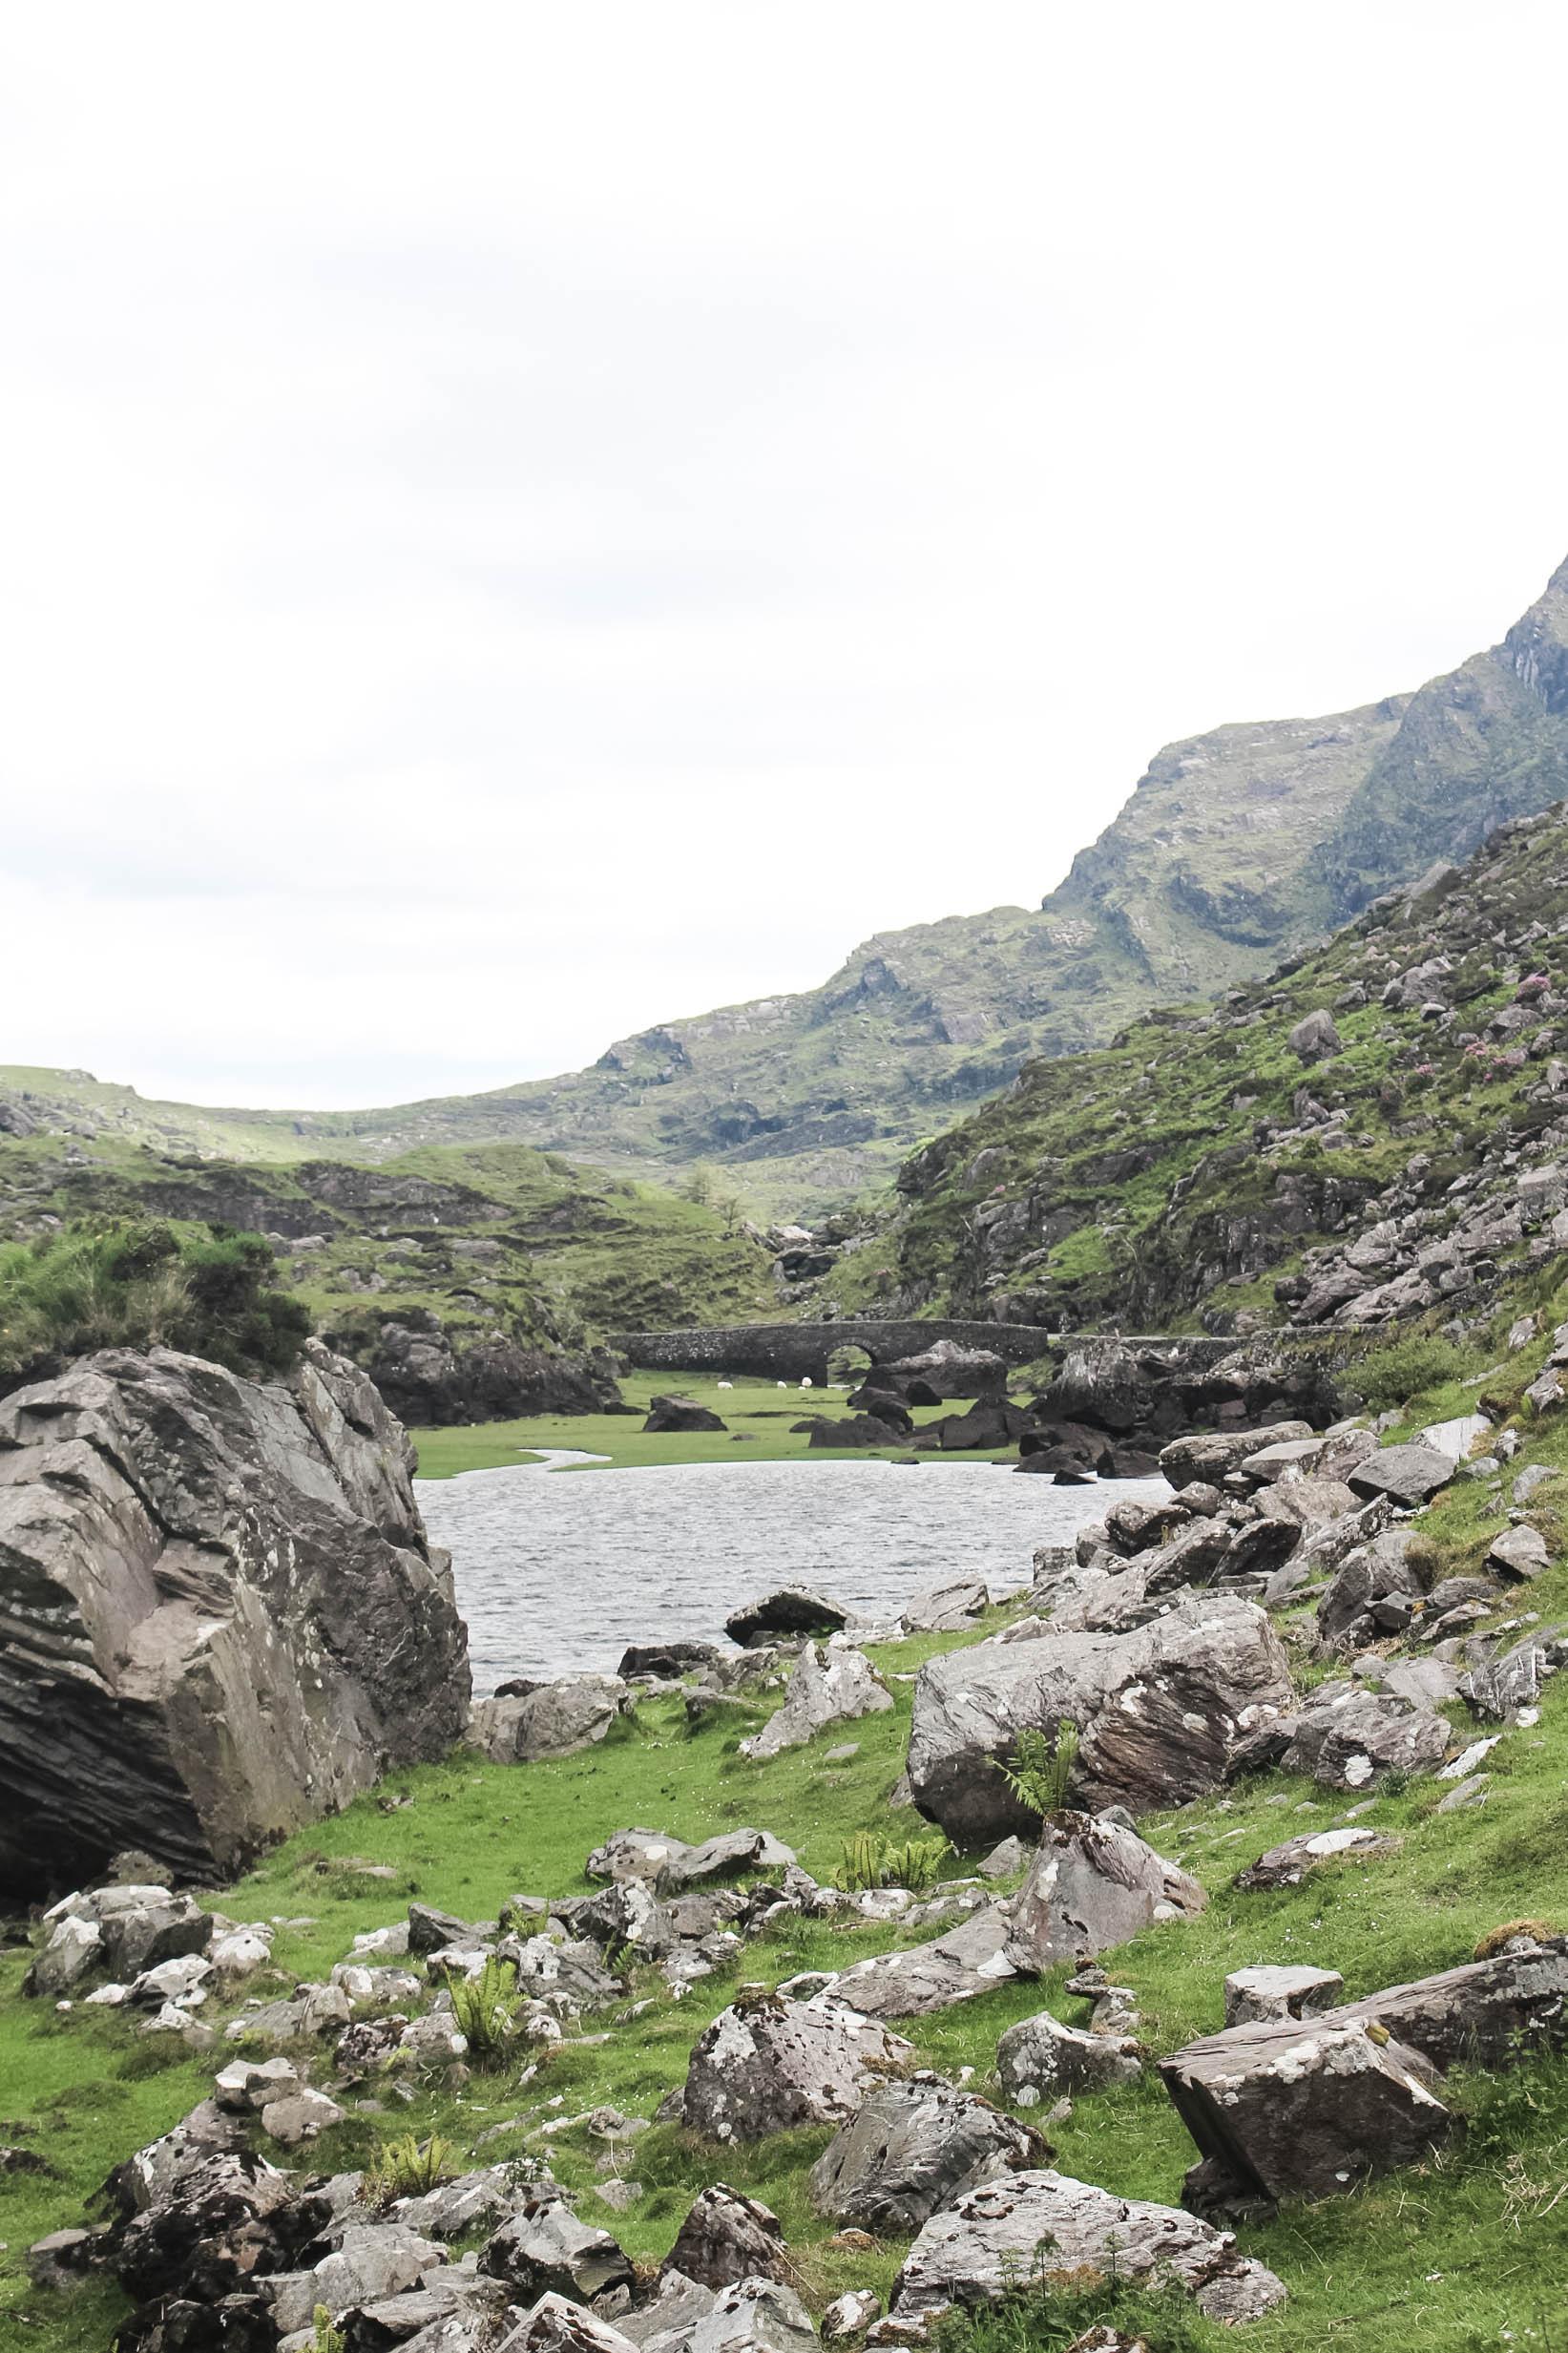 Traveling in Ireland - Things to do, Gap of Dunloe, Killarney